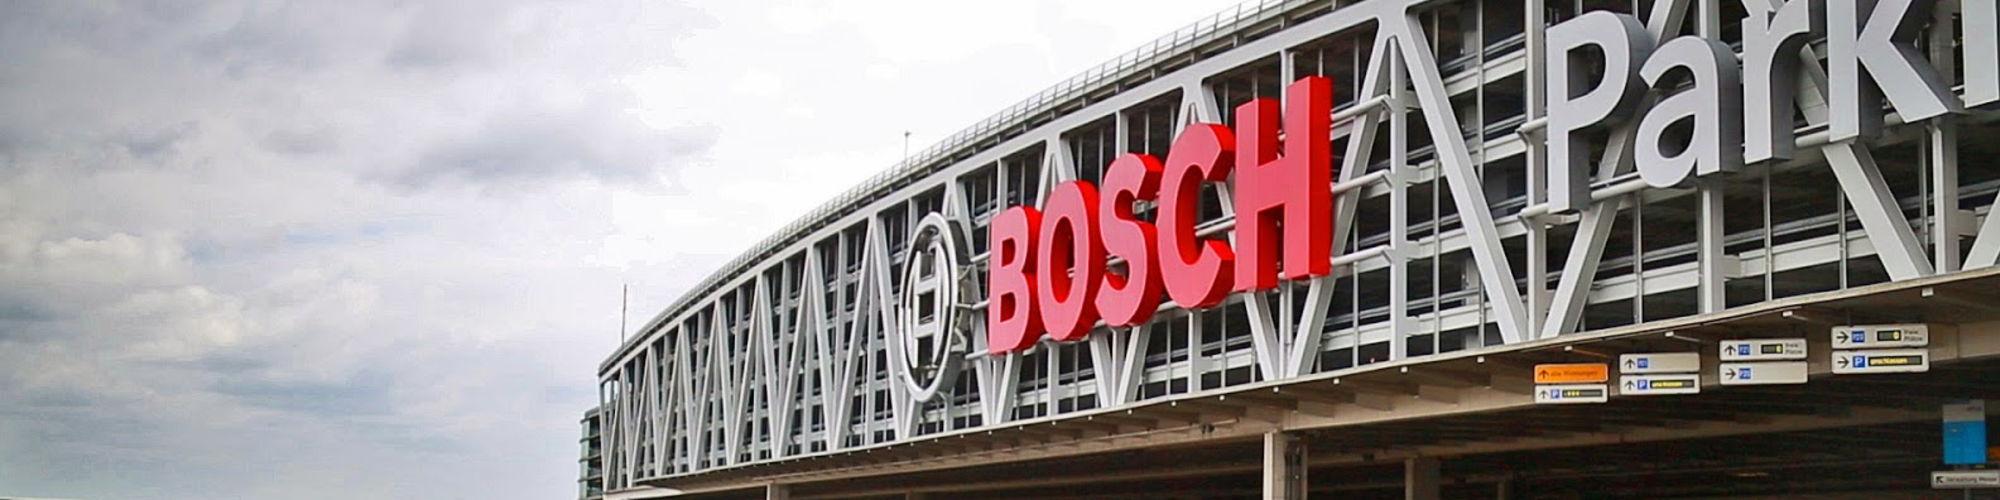 Bosch Motorsport USA cover image